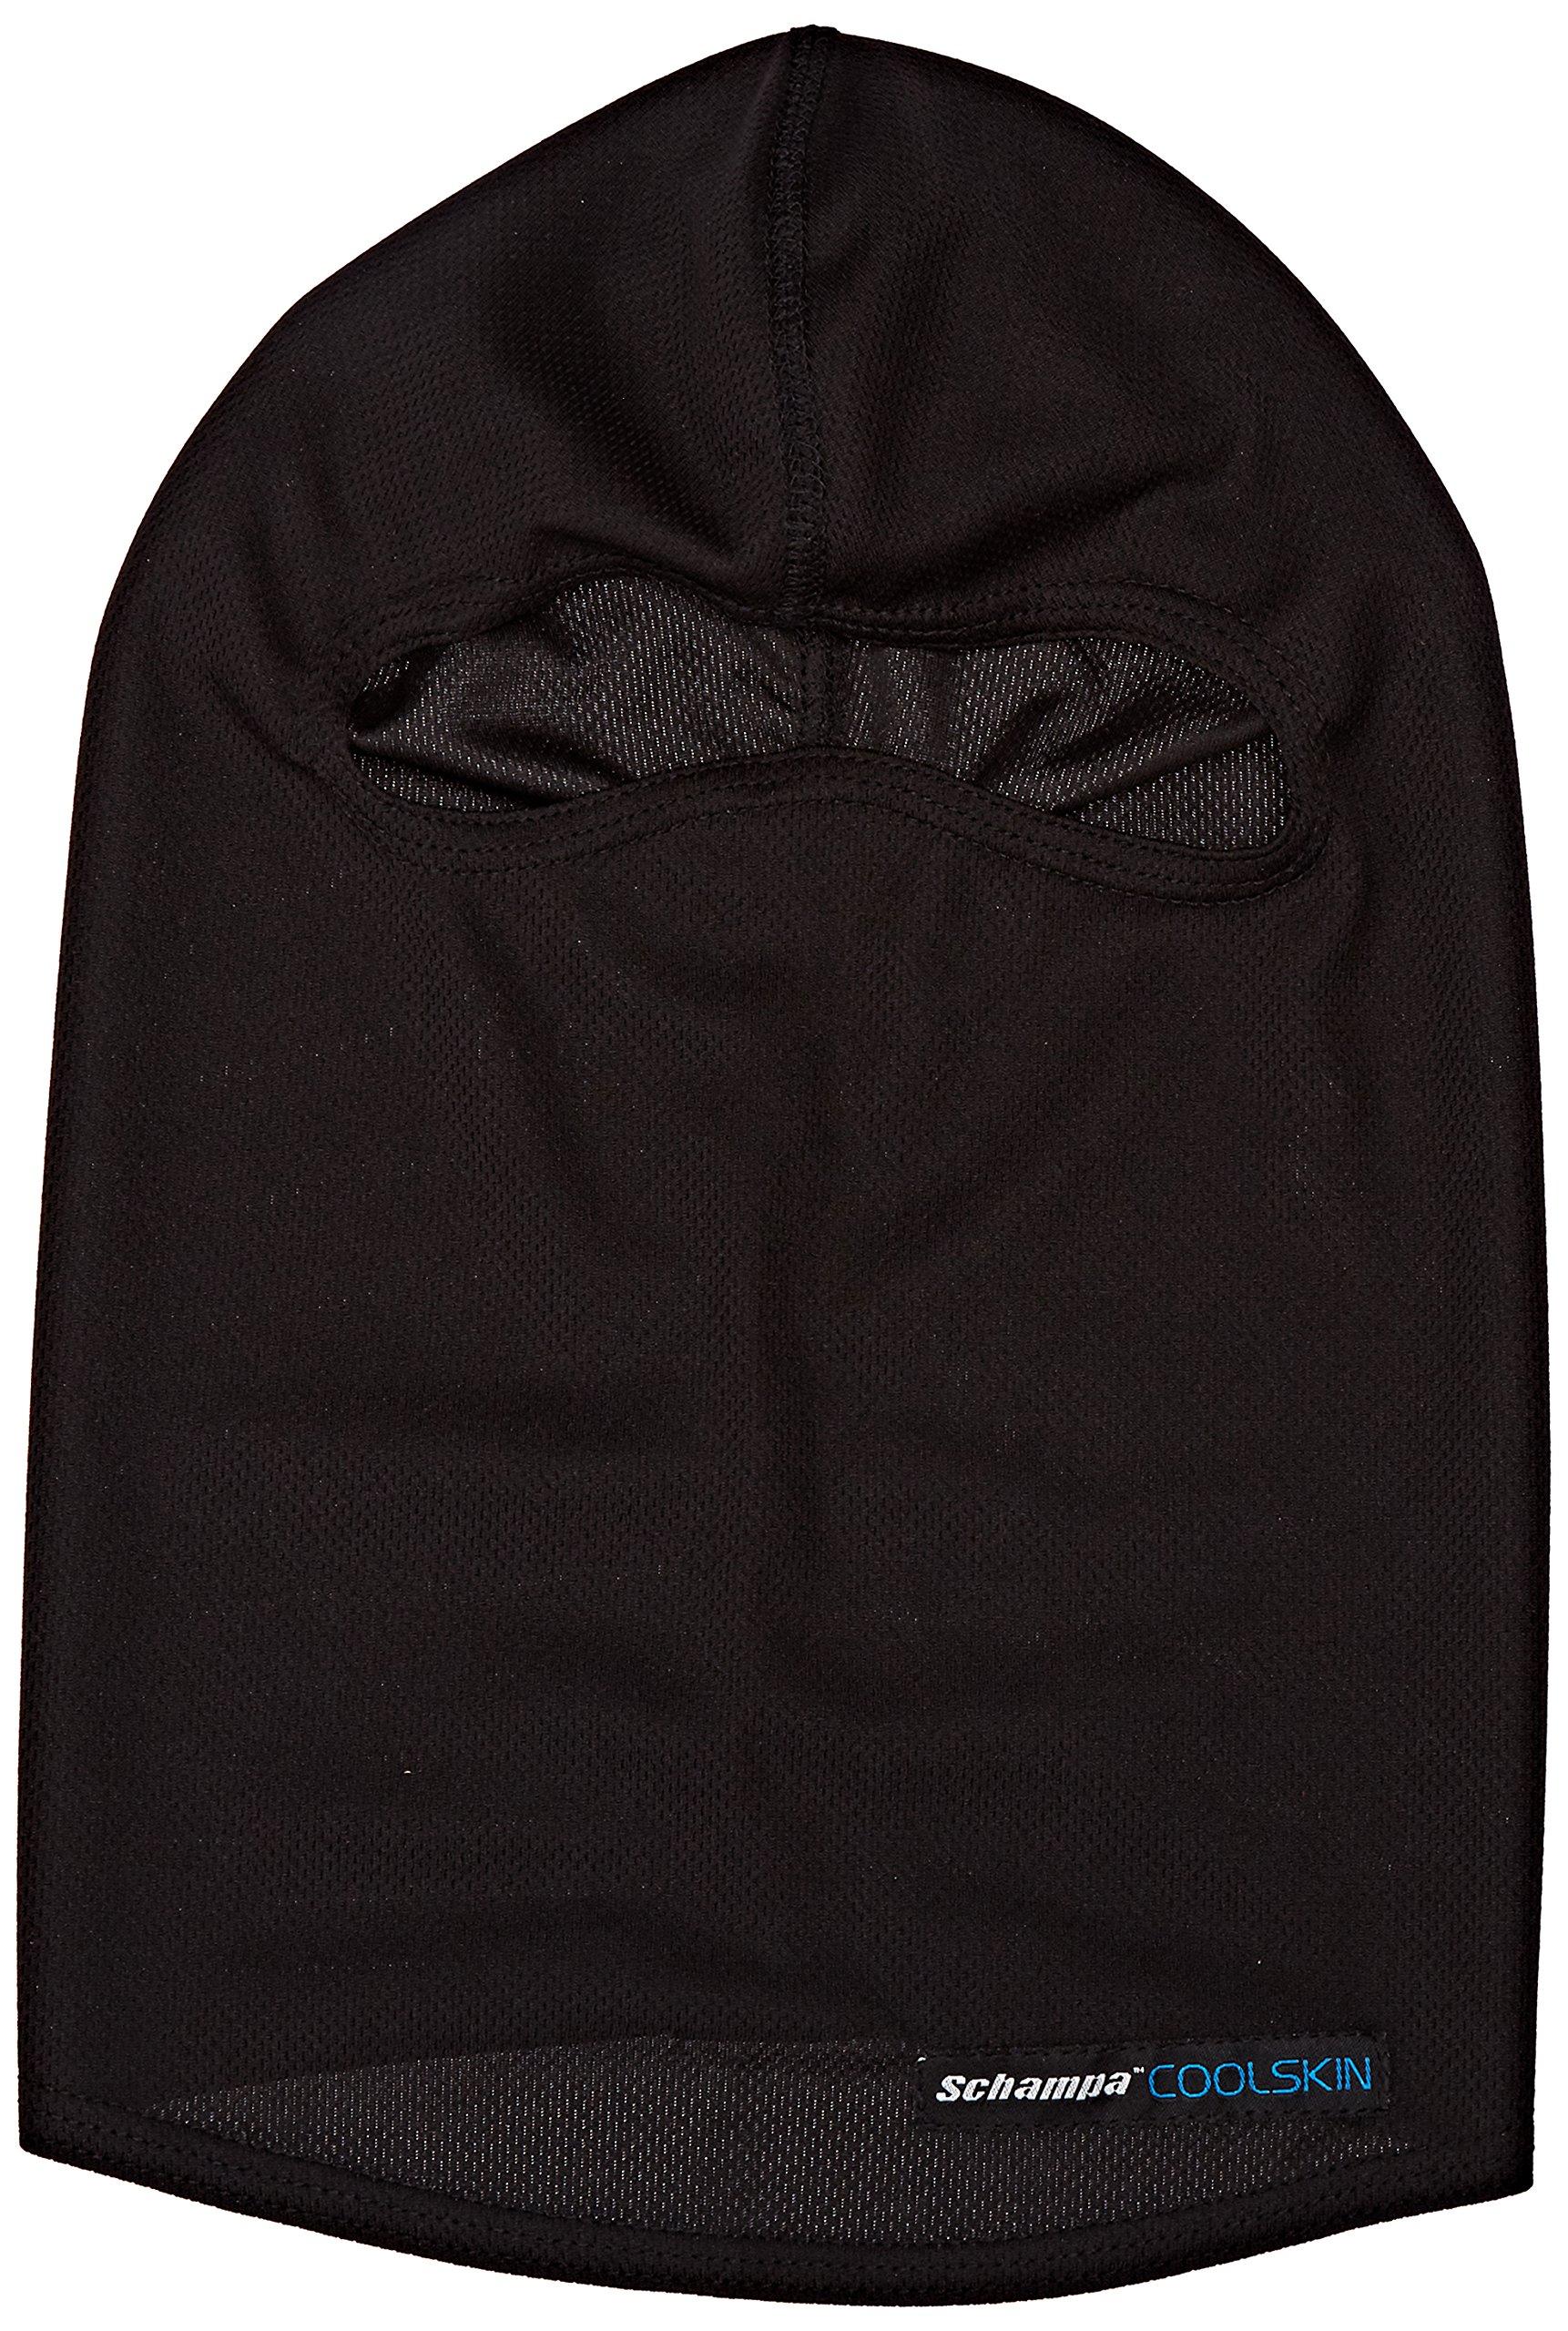 Schampa CoolSkin Balaclava (Black, One Size)